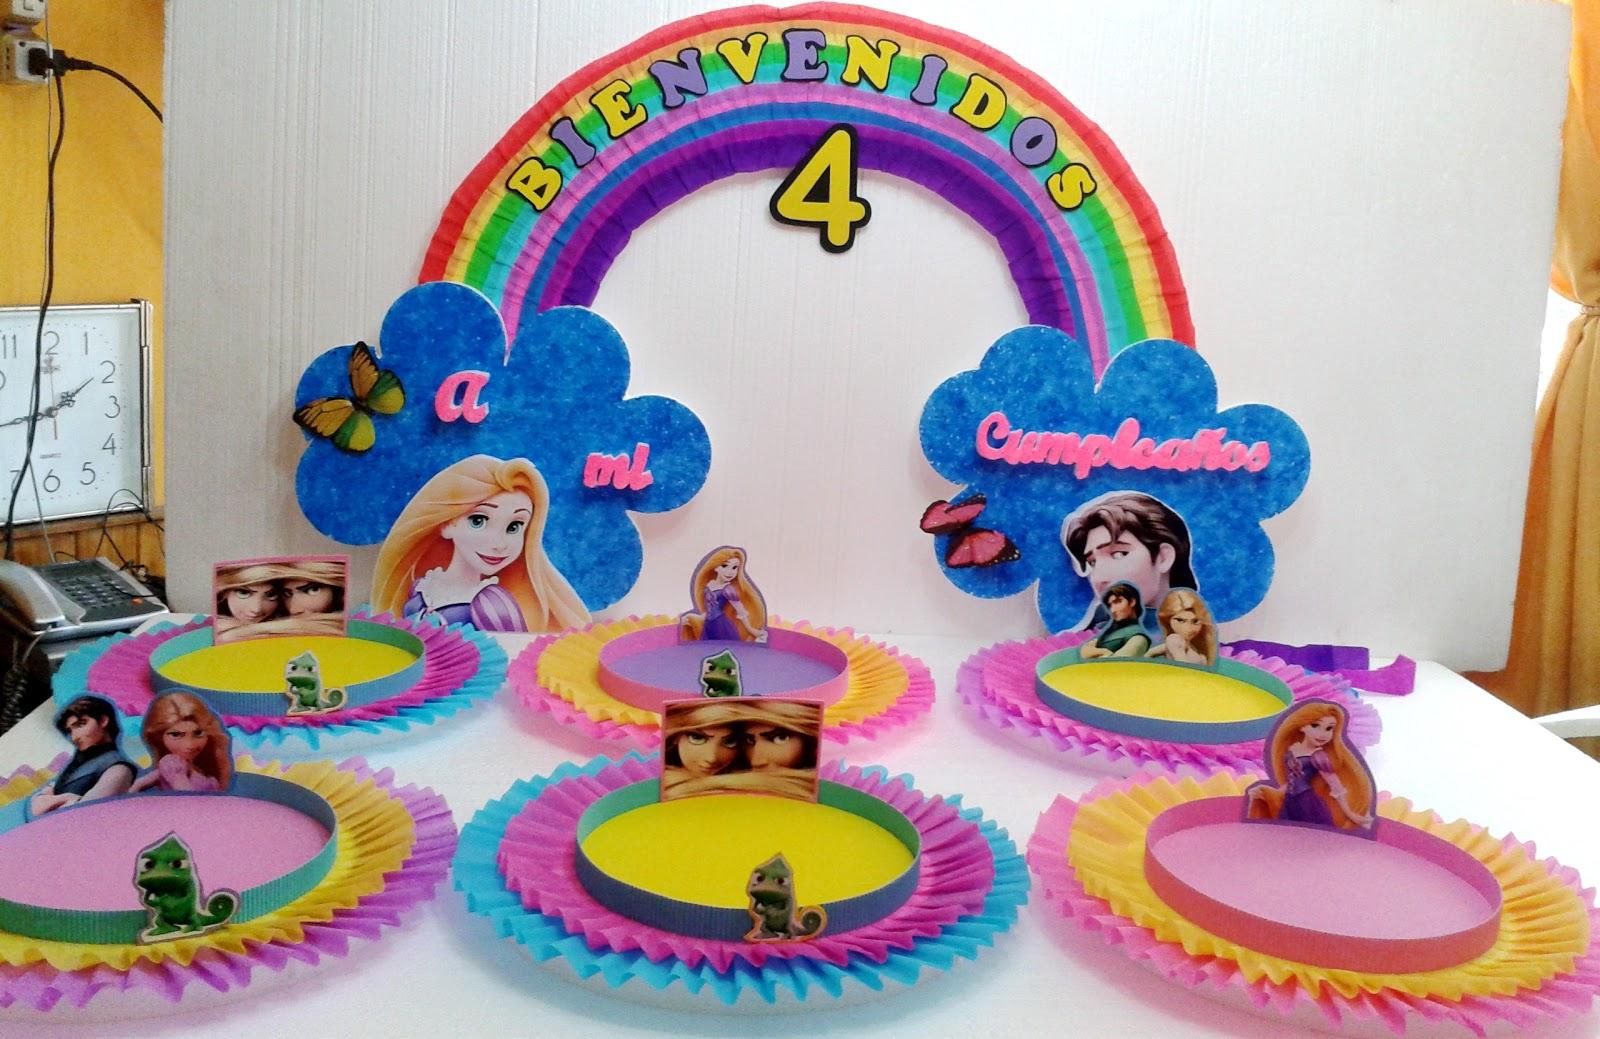 Decoracion De Rapunzel Para Fiestas Infantiles ~ Decoraci?n de rapunzel para fiestas infantiles  Imagui